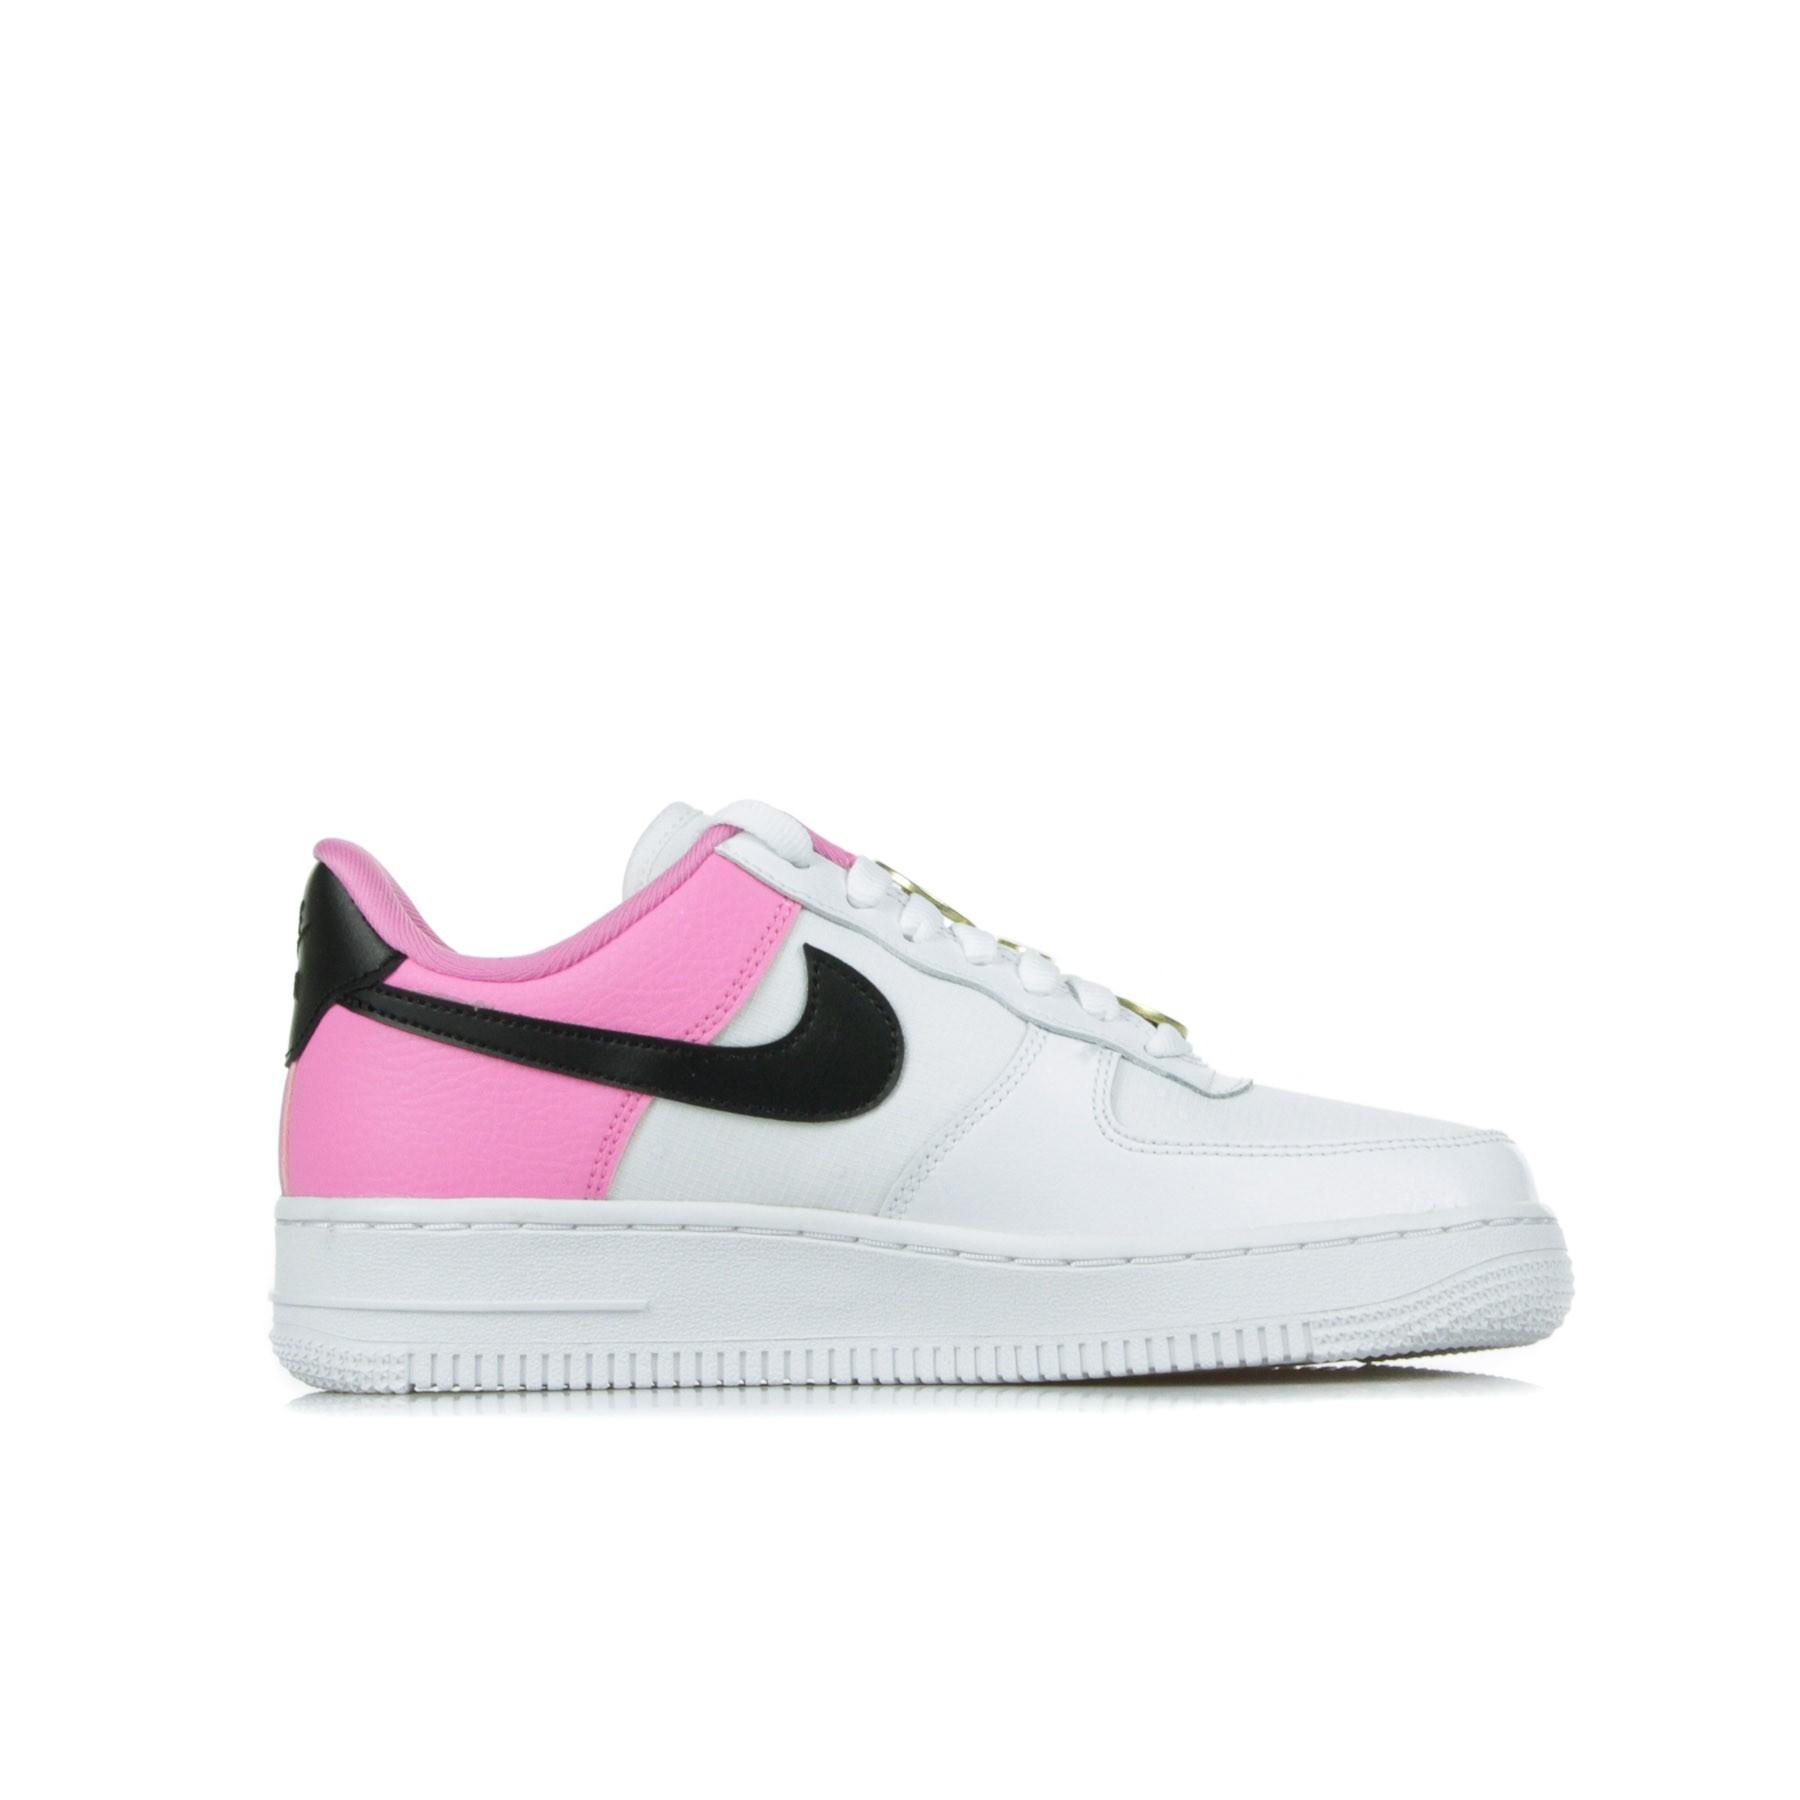 nike air force 1 con baffo rosa